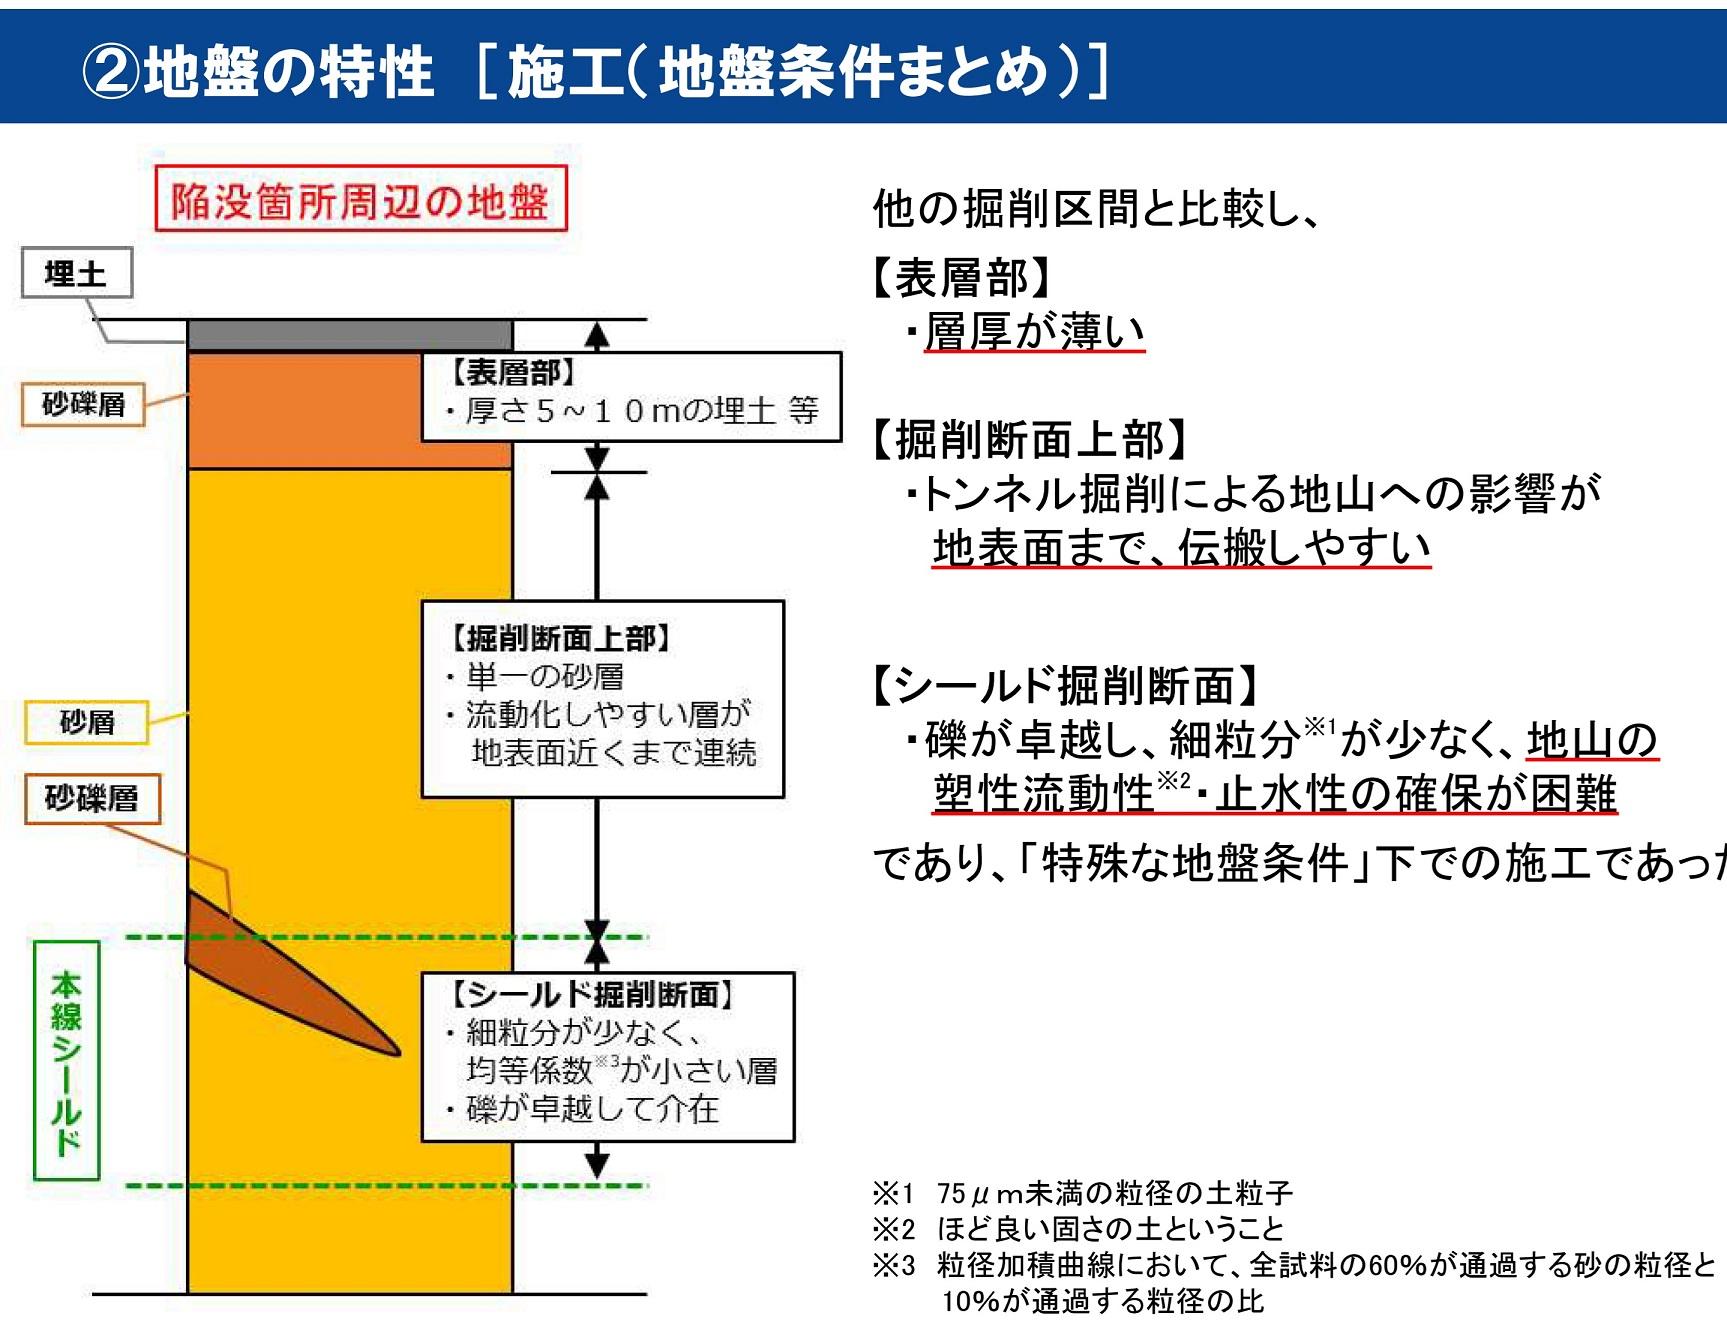 http://yamadakohei.jp/blog_upfile/%E5%A4%96%E7%92%B0%E5%9C%B0%E4%B8%AD%E9%99%A5%E6%B2%A1%E4%B8%AD%E9%96%93%E5%A0%B1%E5%91%8A1.jpg